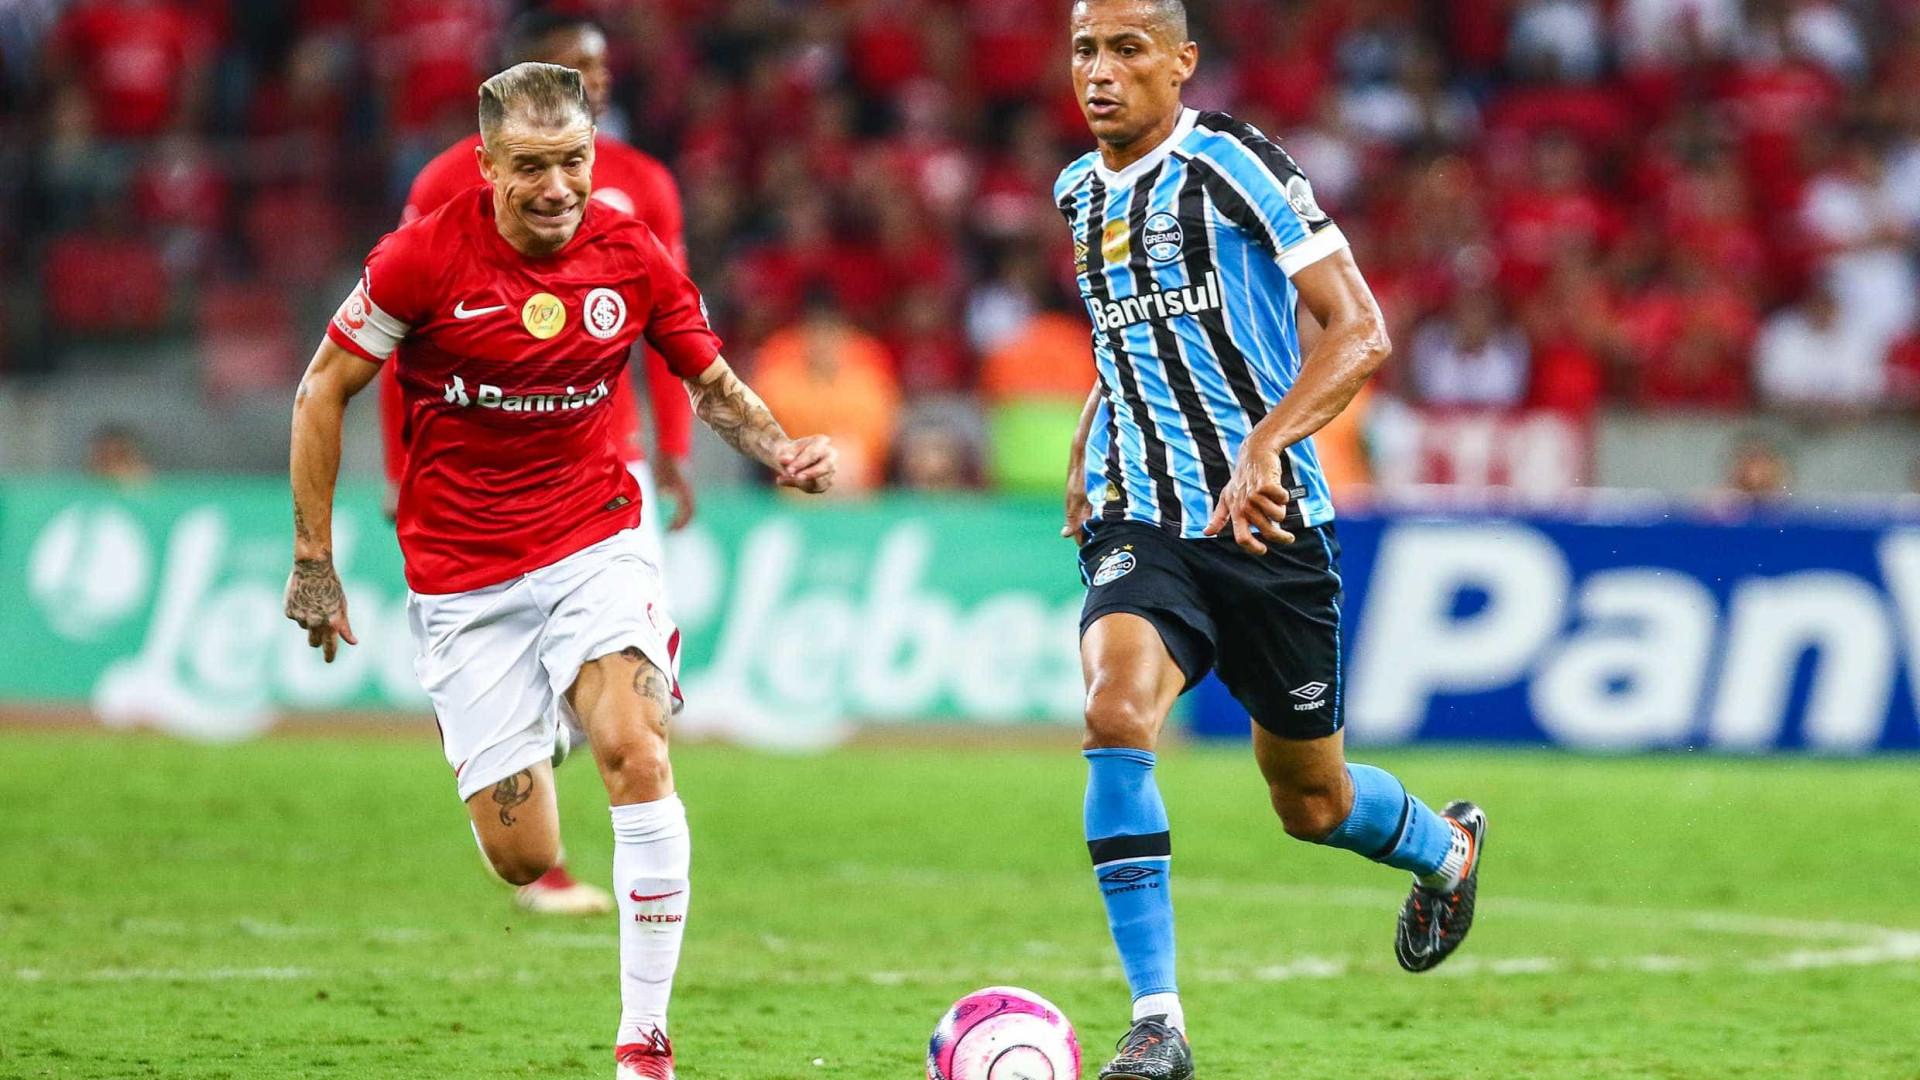 Moledo valoriza vitória na estreia: